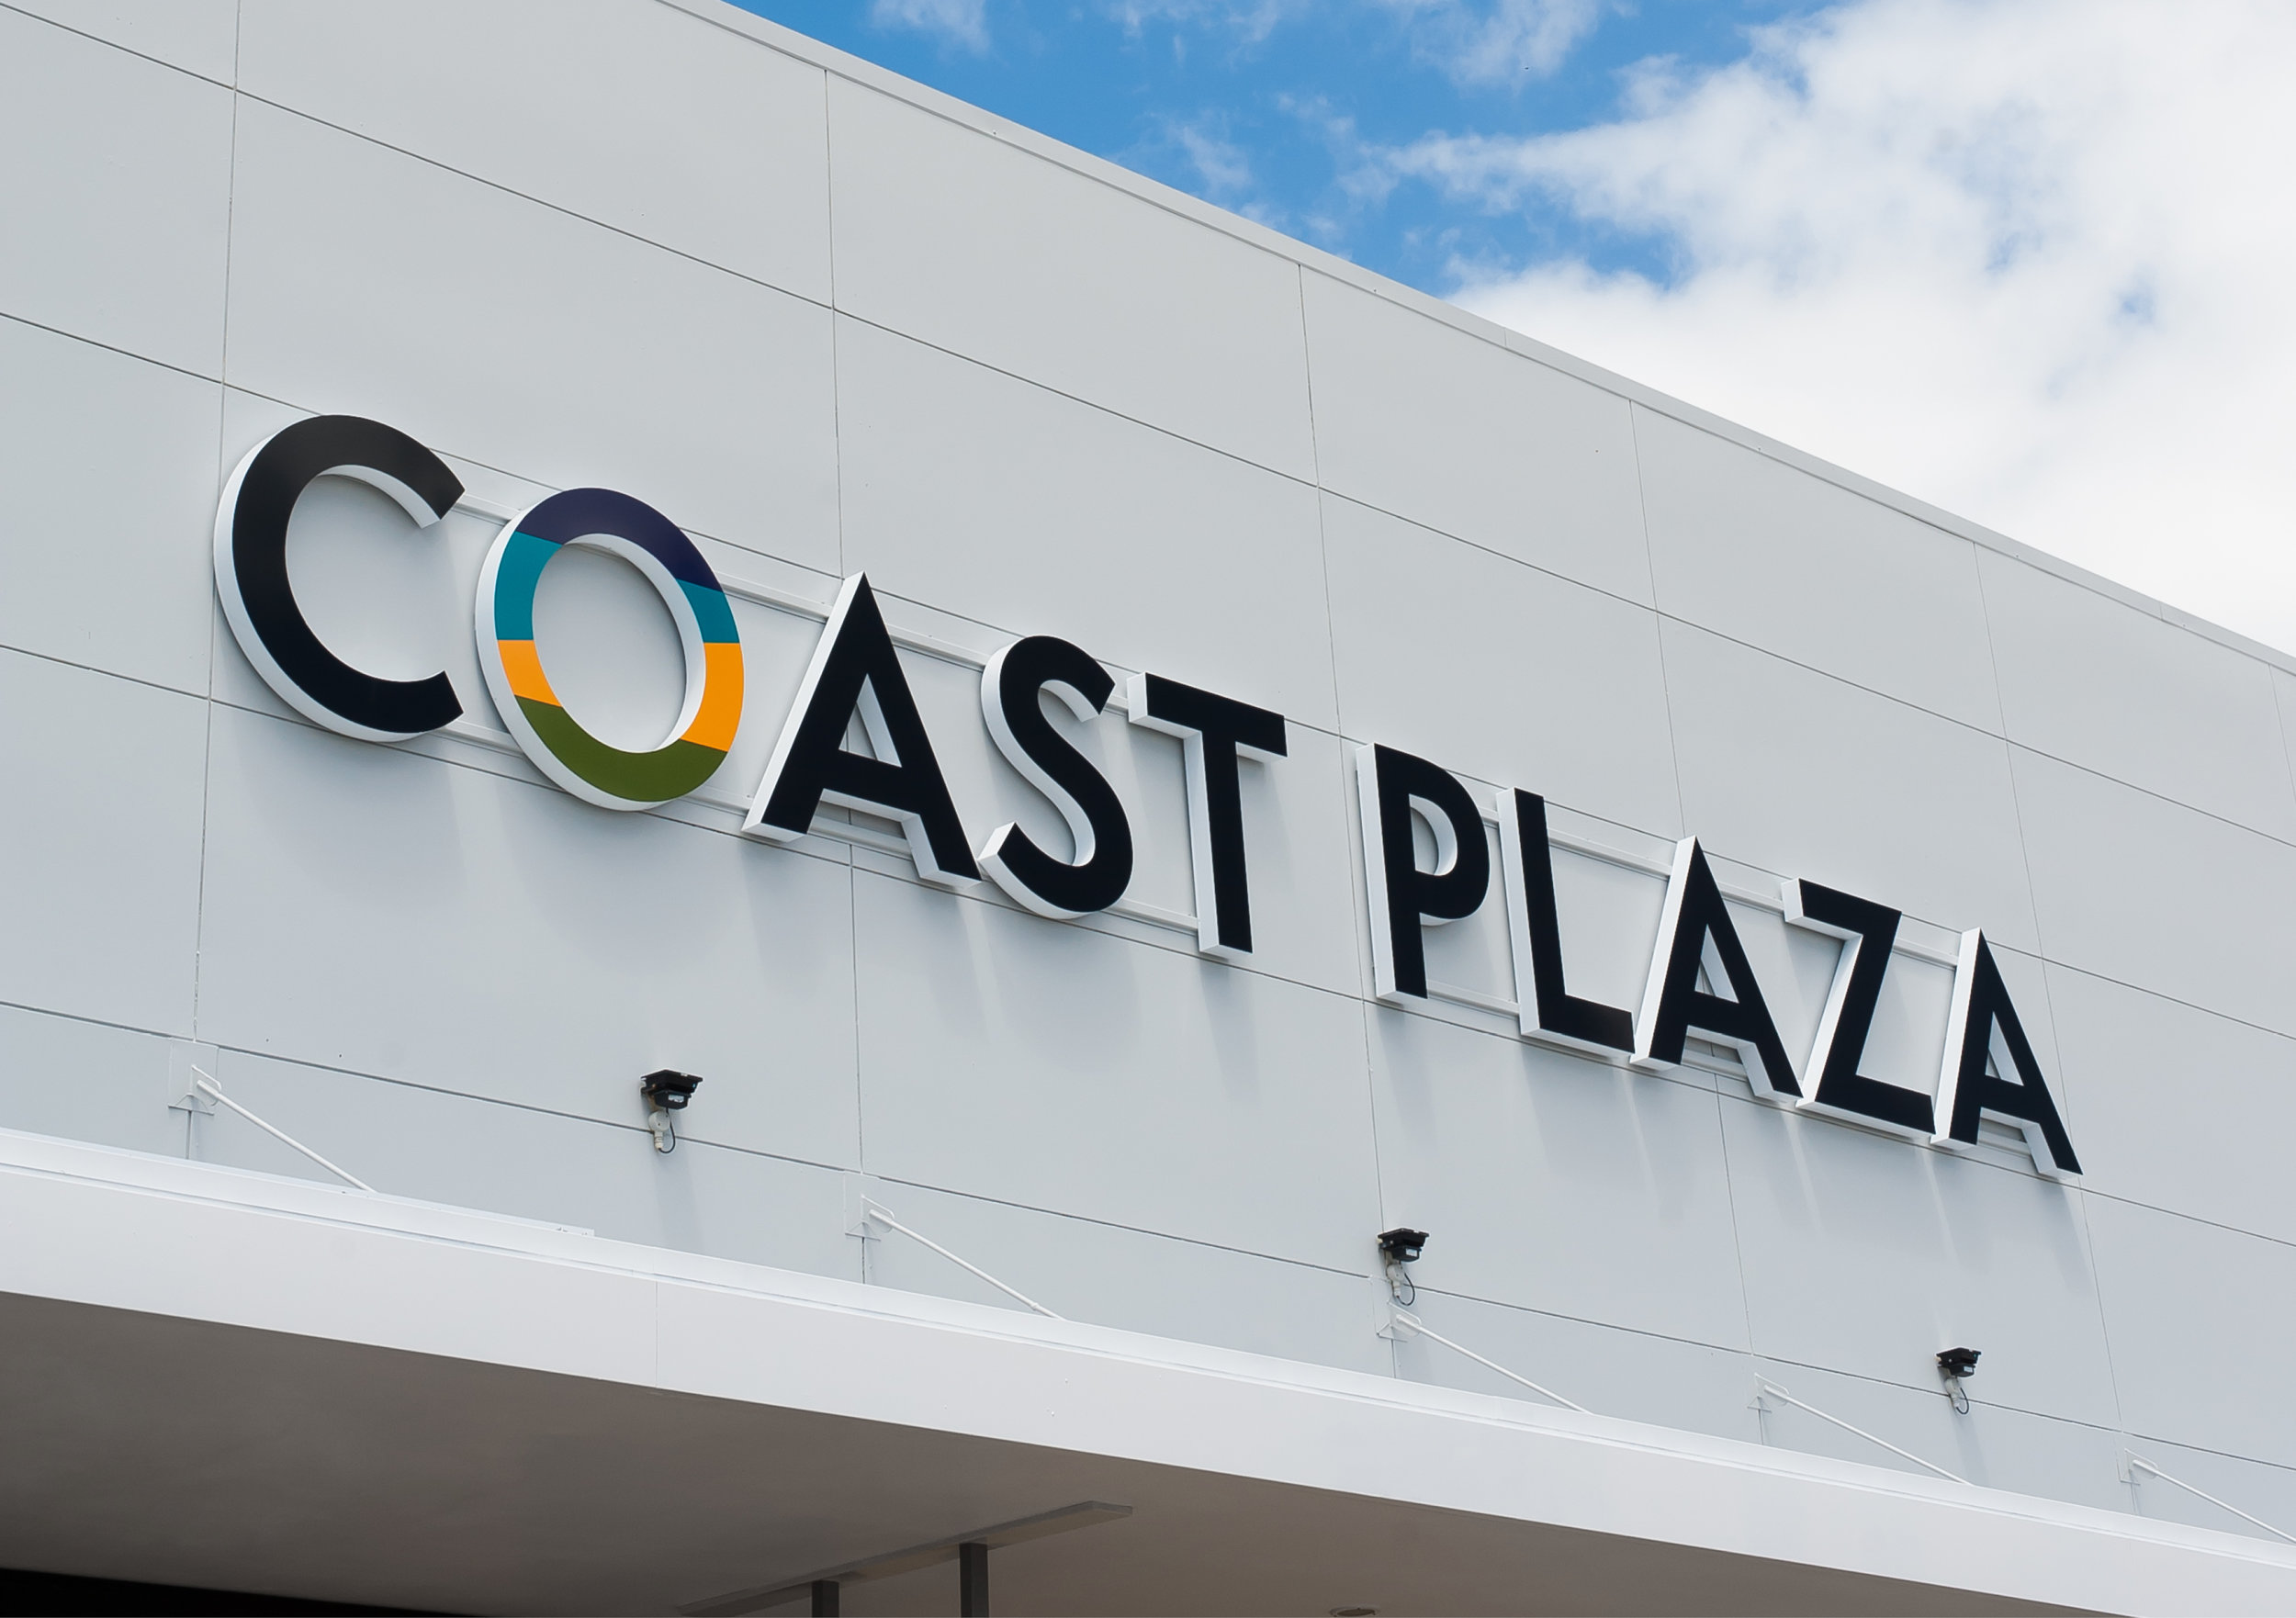 Coast Plaza exterior signage